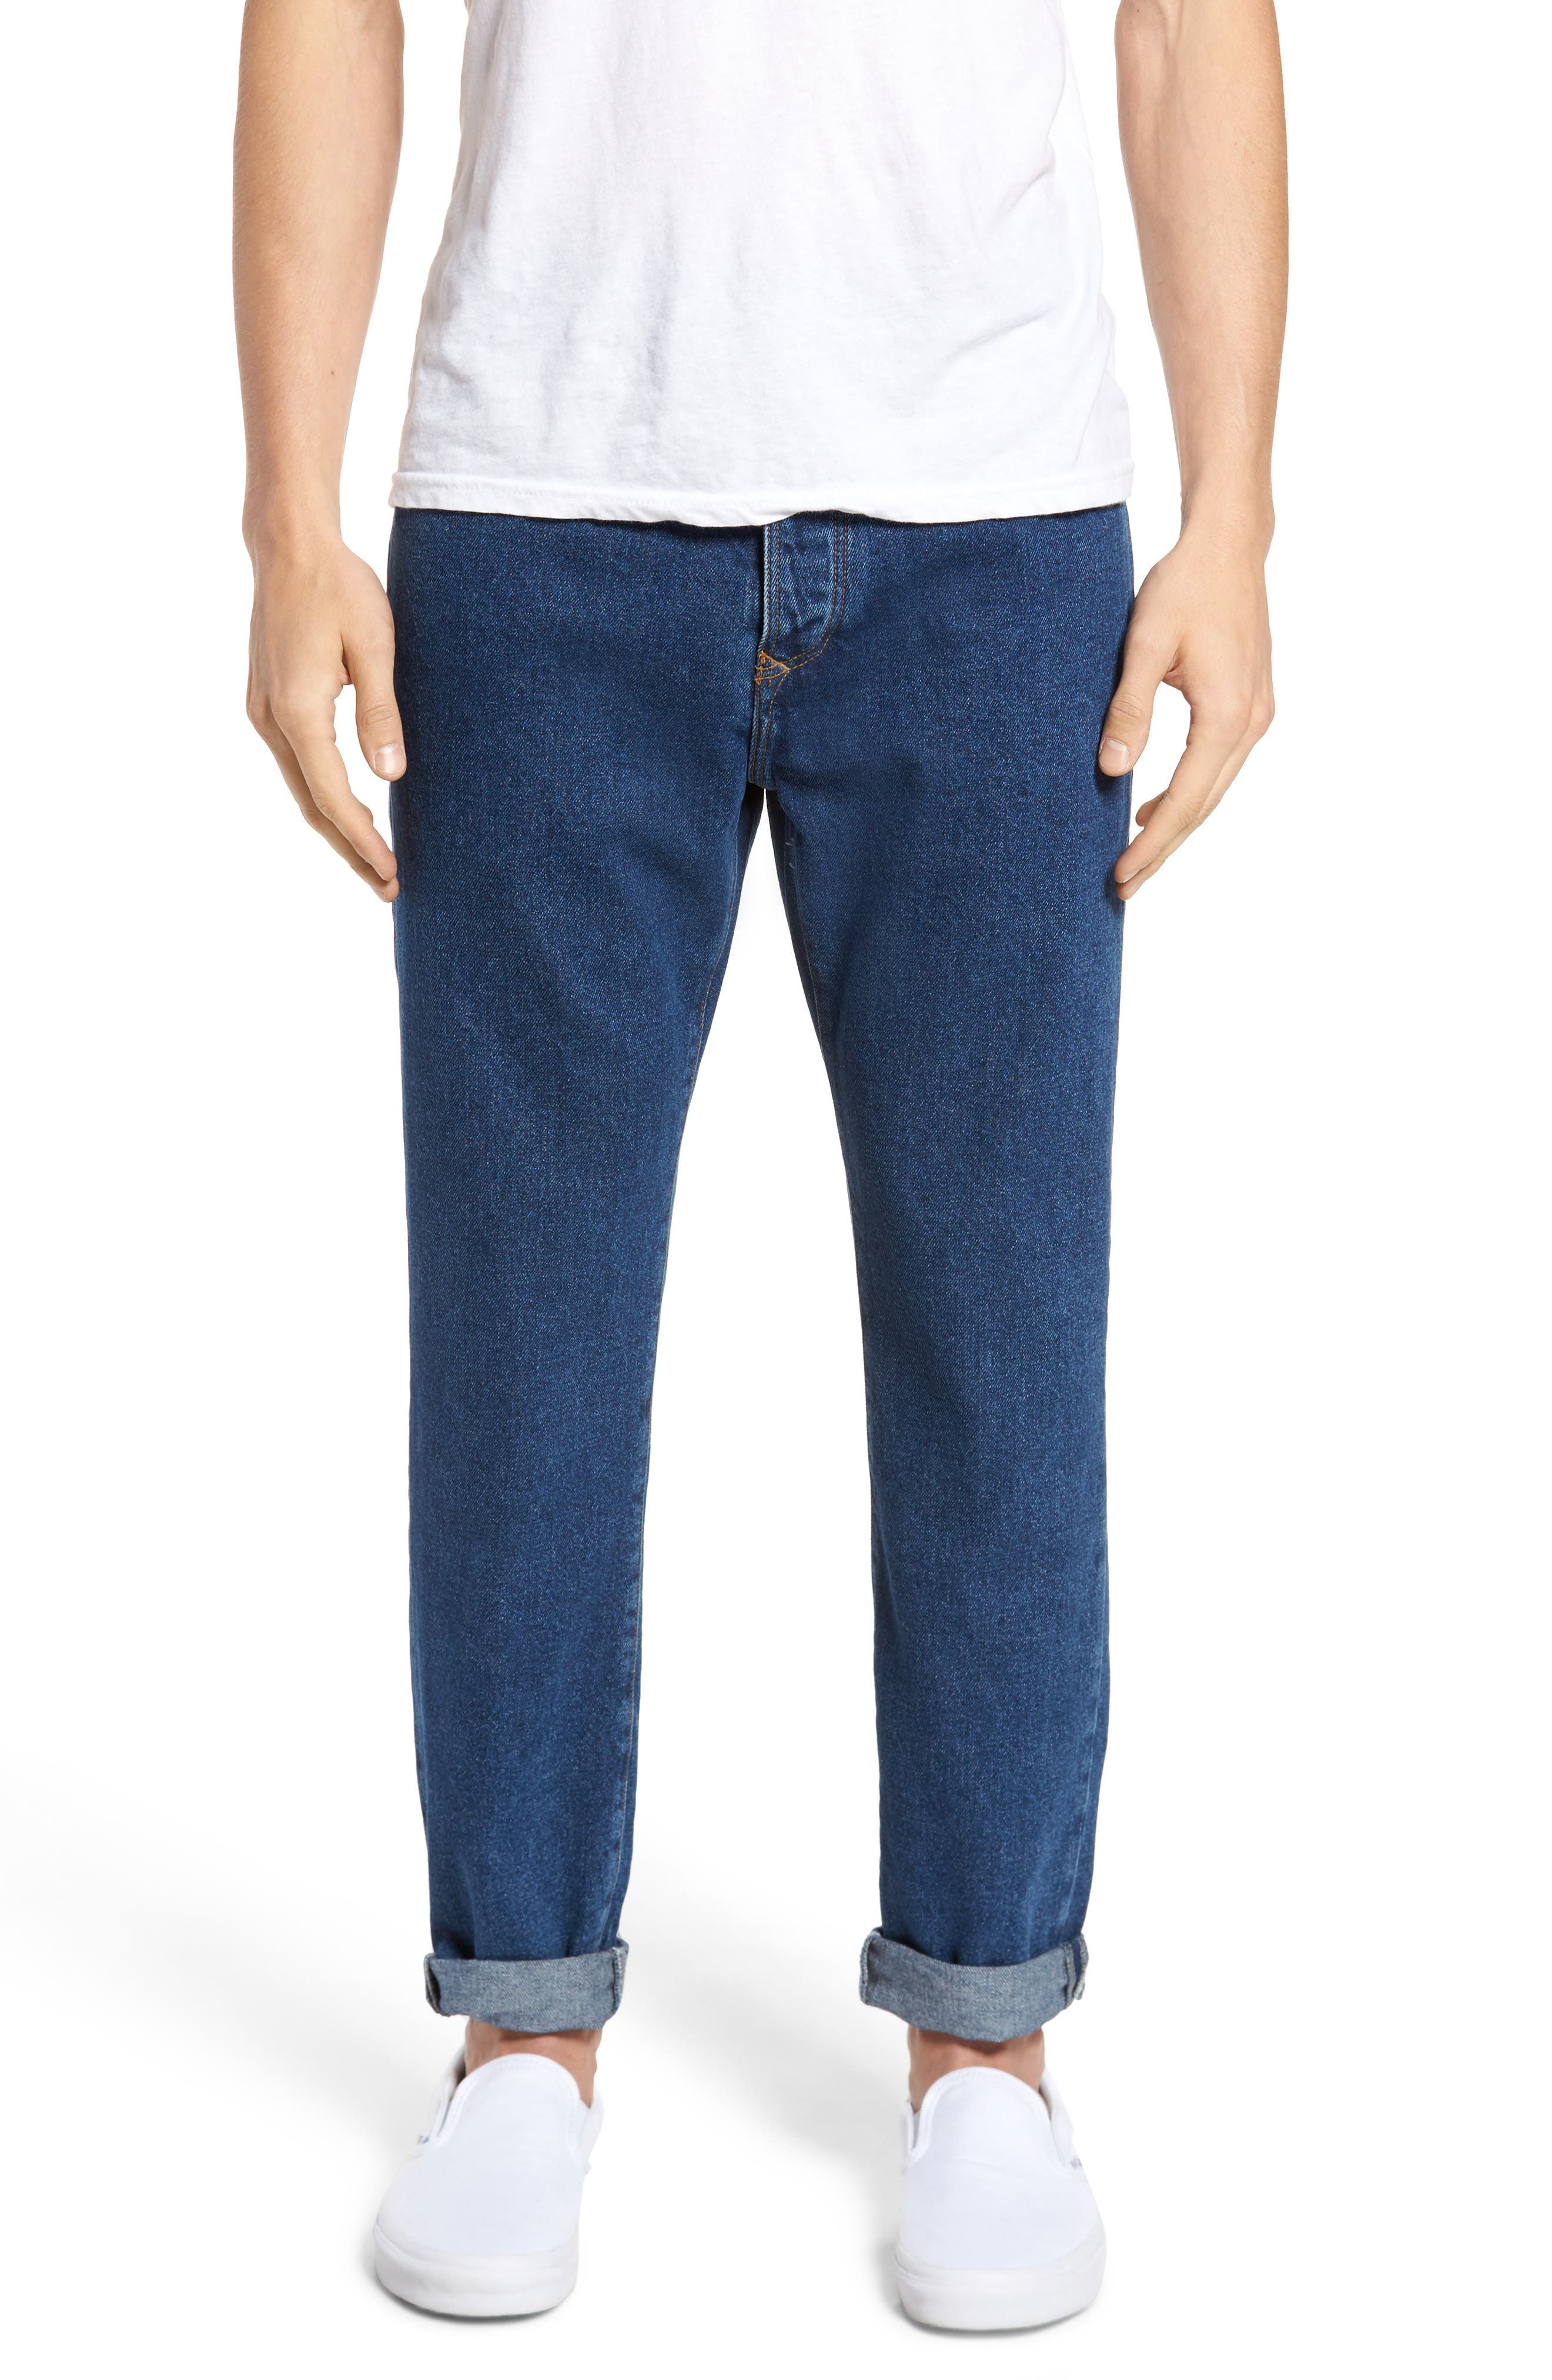 90s Classic Straight Leg Jeans,                             Main thumbnail 1, color,                             Denim Blue